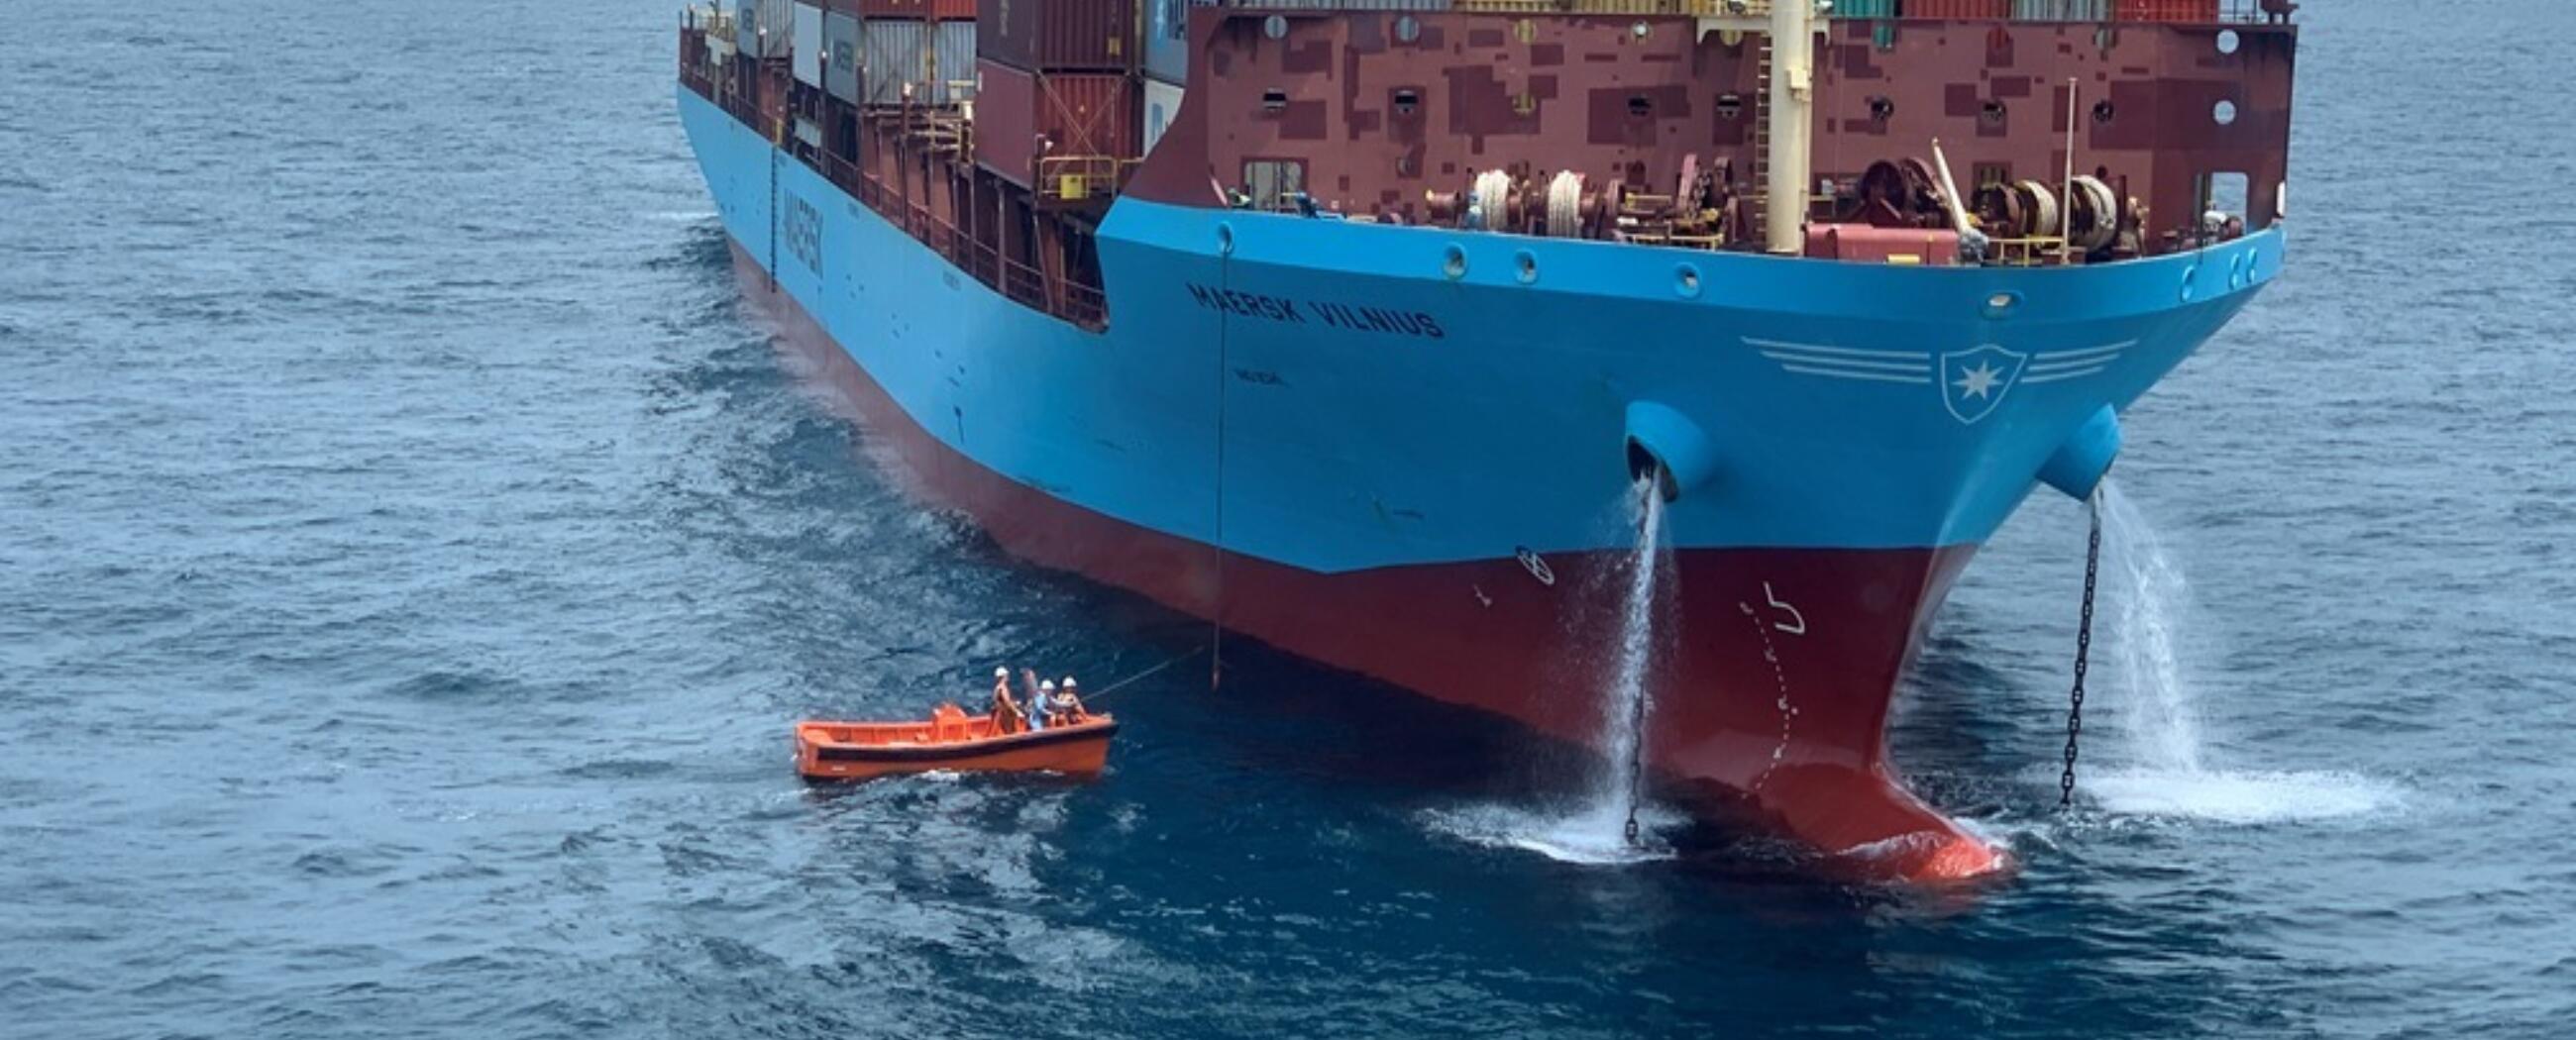 ALP-Defender-Receiving-Kenter-Maersk-Vilnius.JPG